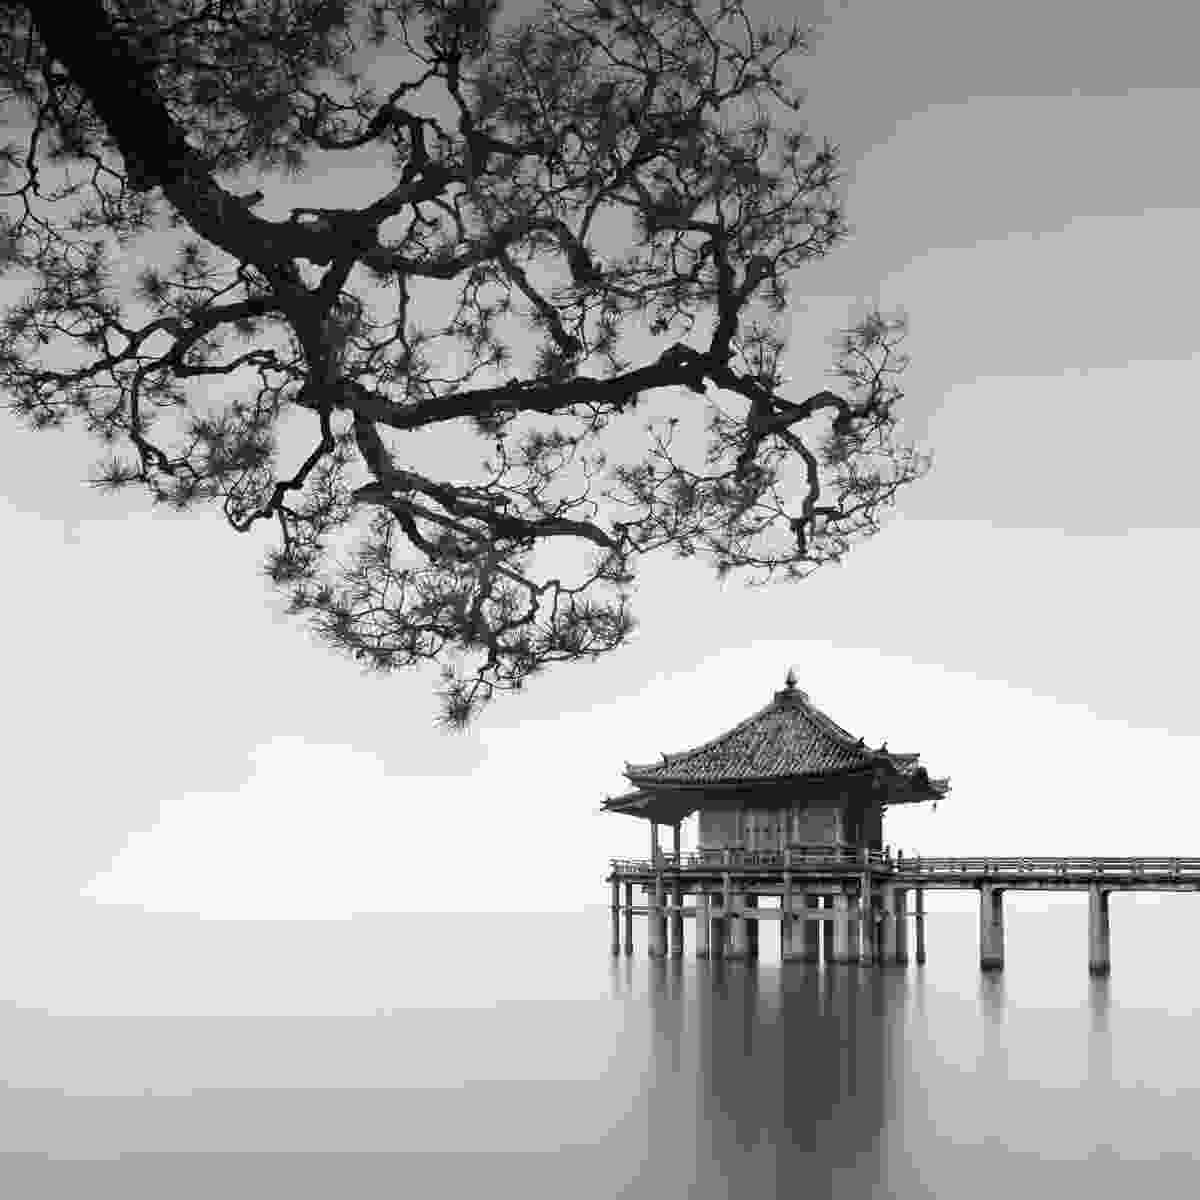 Temple Honshu, Japan (Jonathan Chritchley)